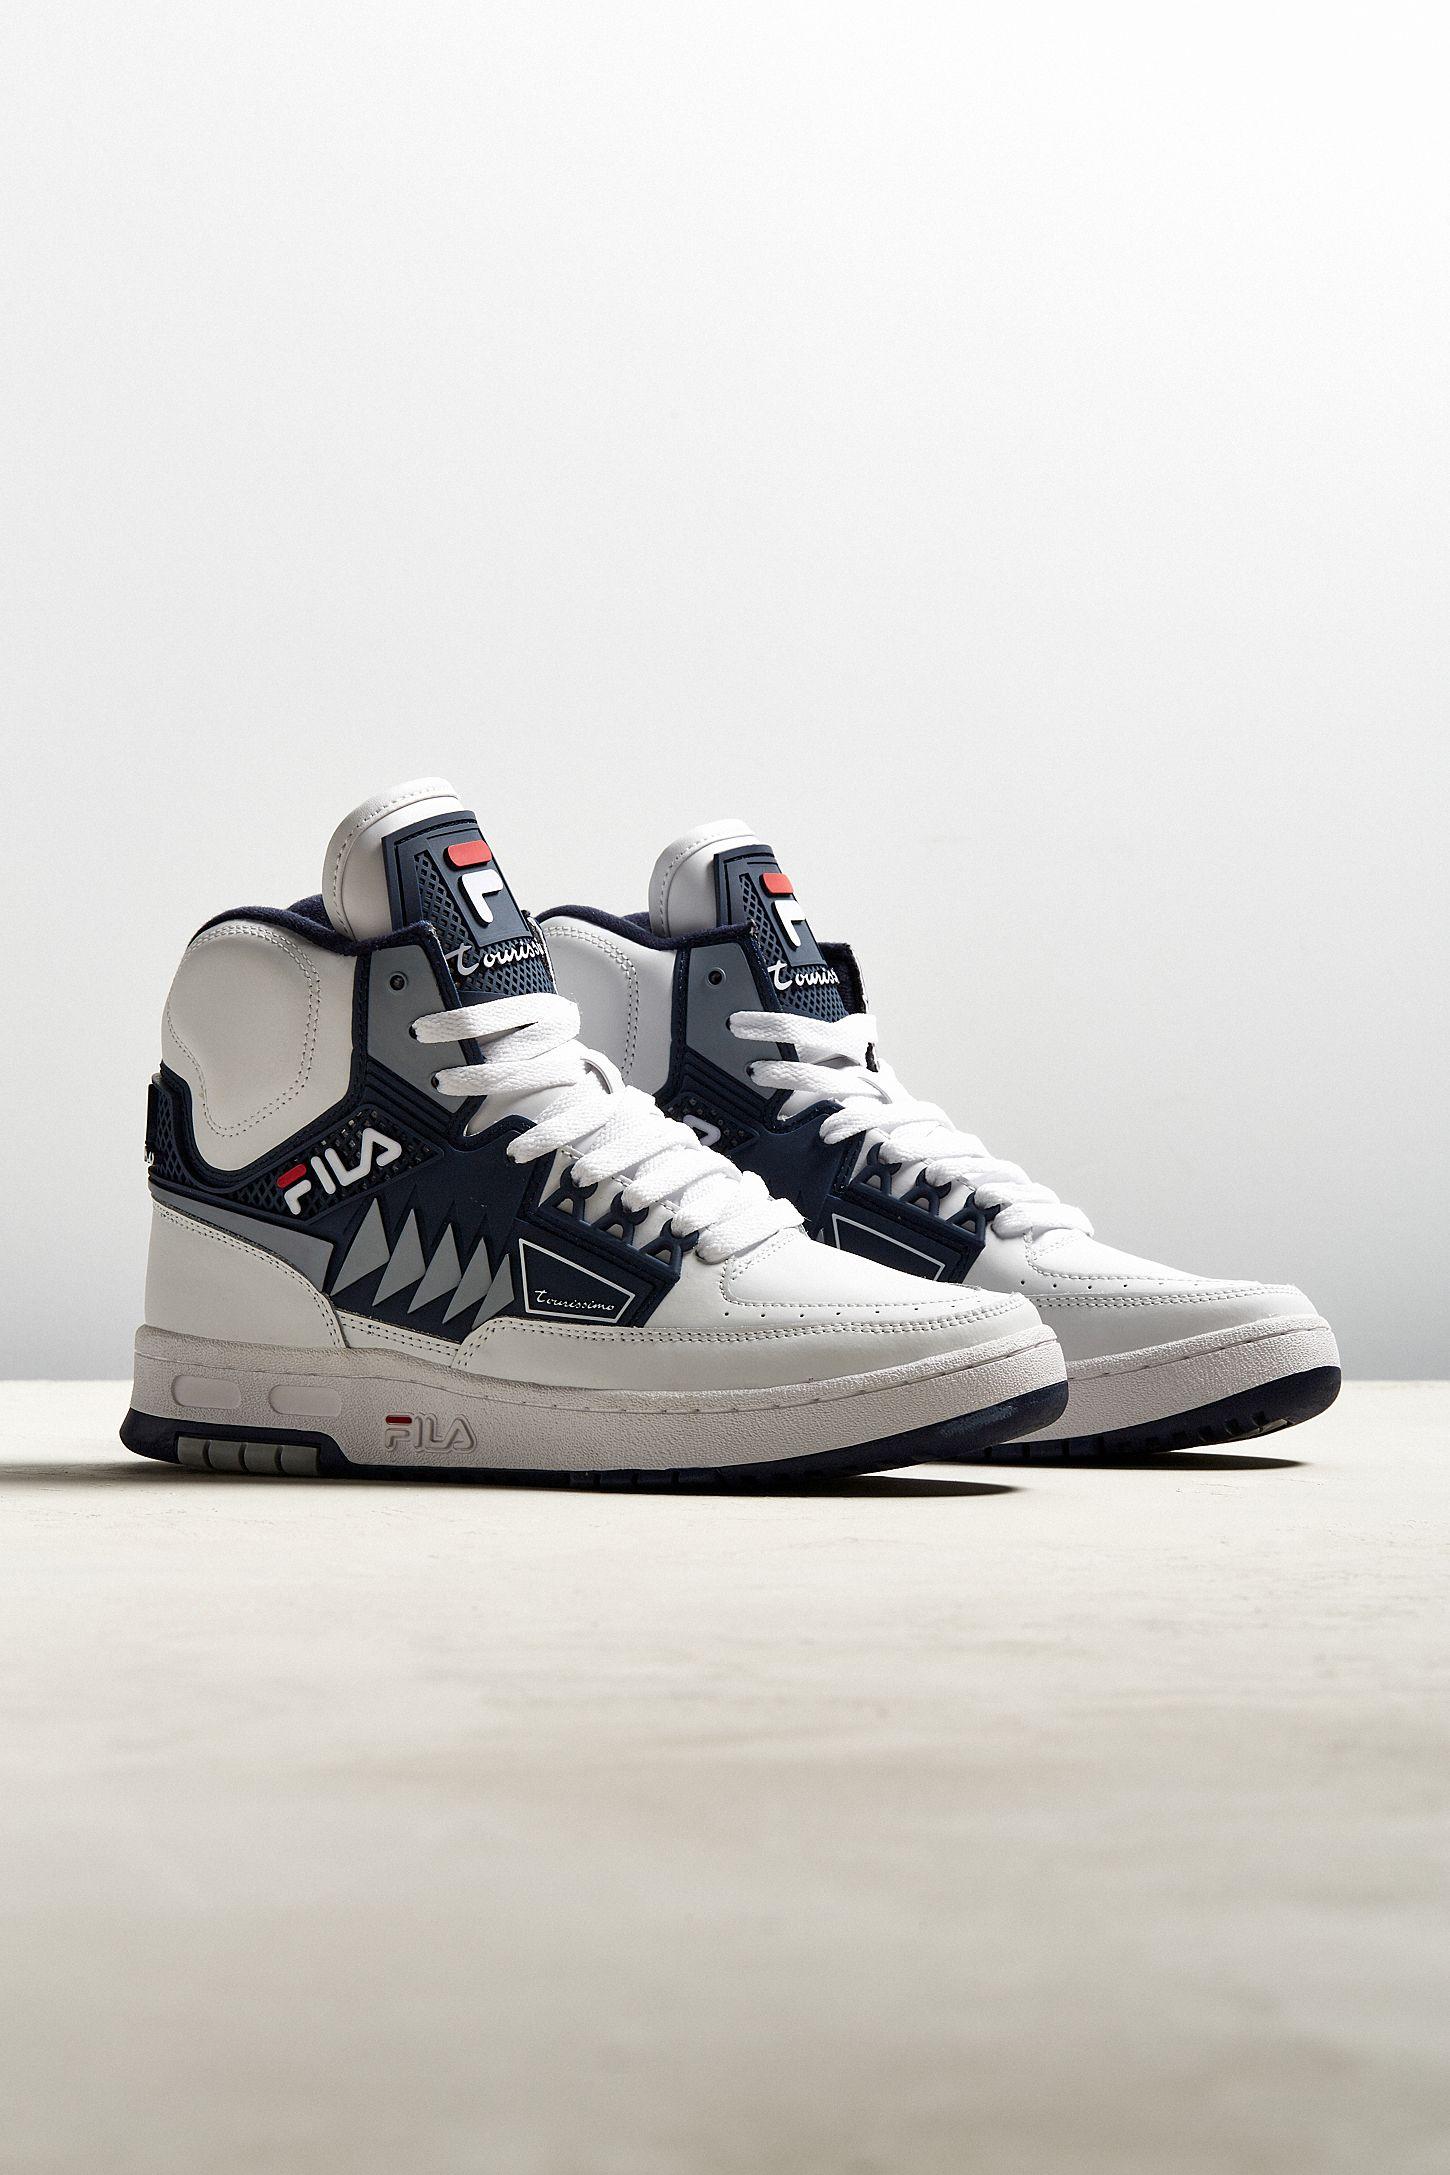 45fb63546f62 FILA Tourissimo Sneaker